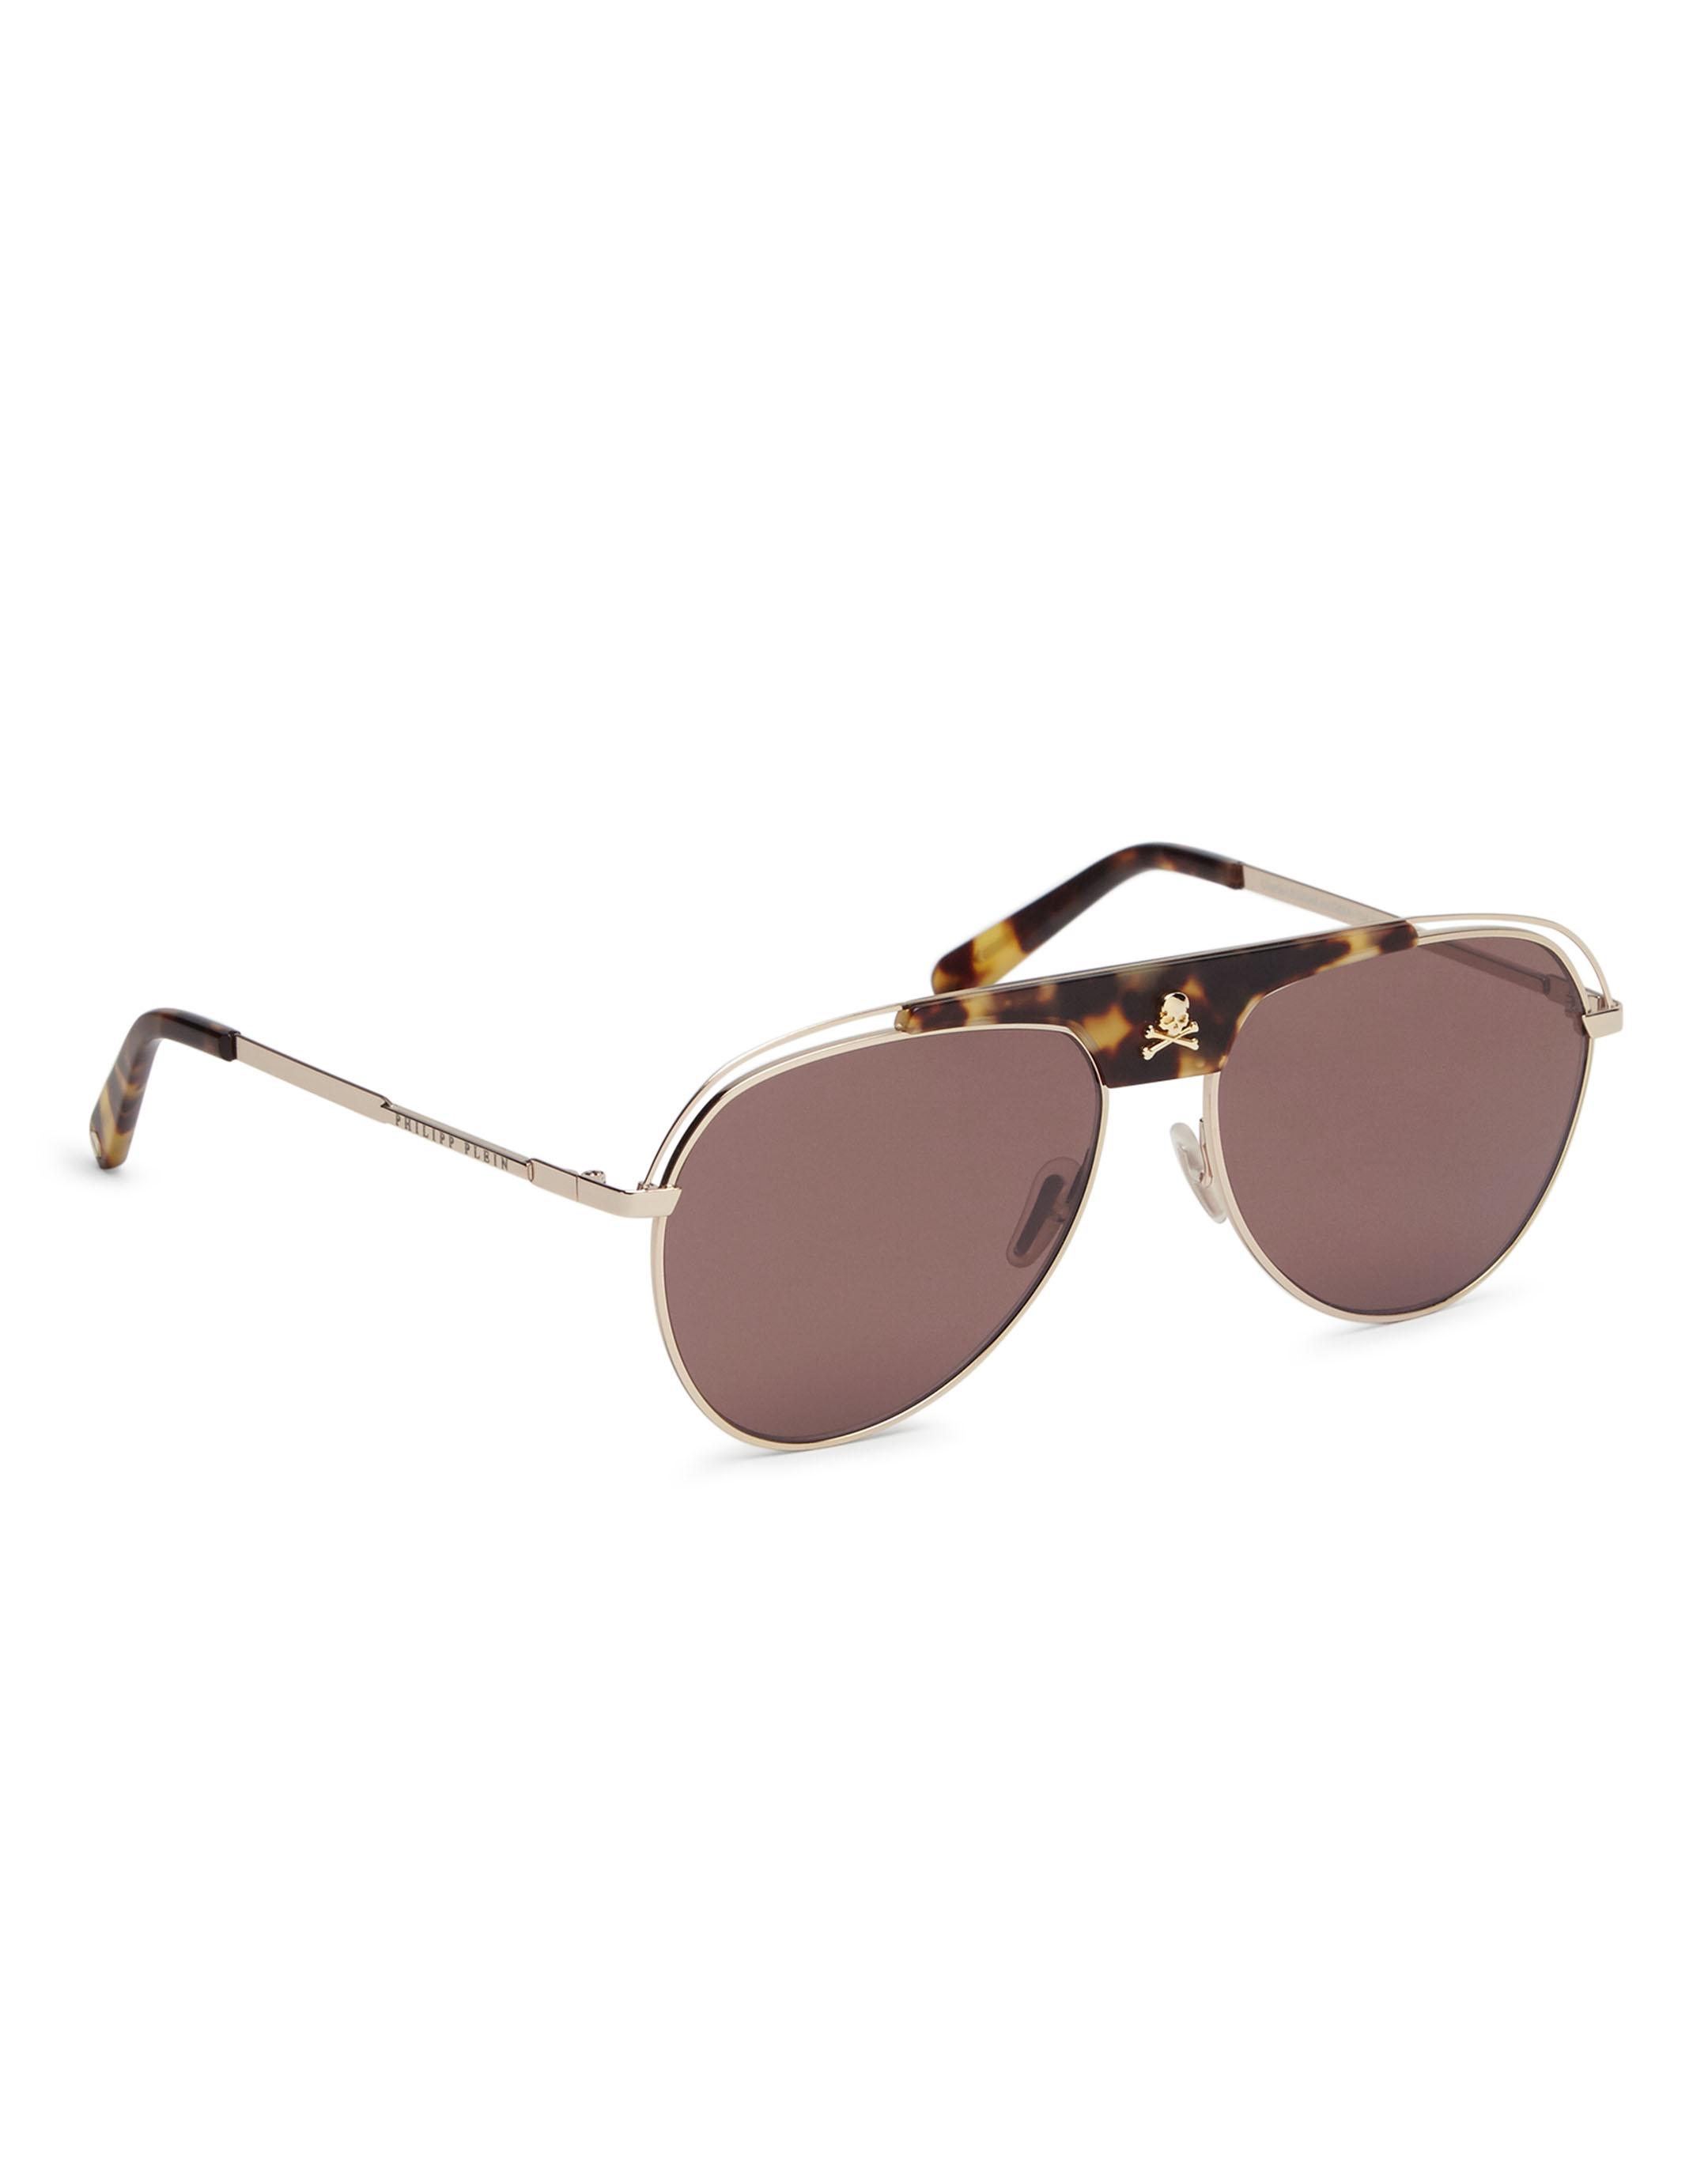 Philipp Plein Sunglasses Charlie Basic p0fhyrn7d9